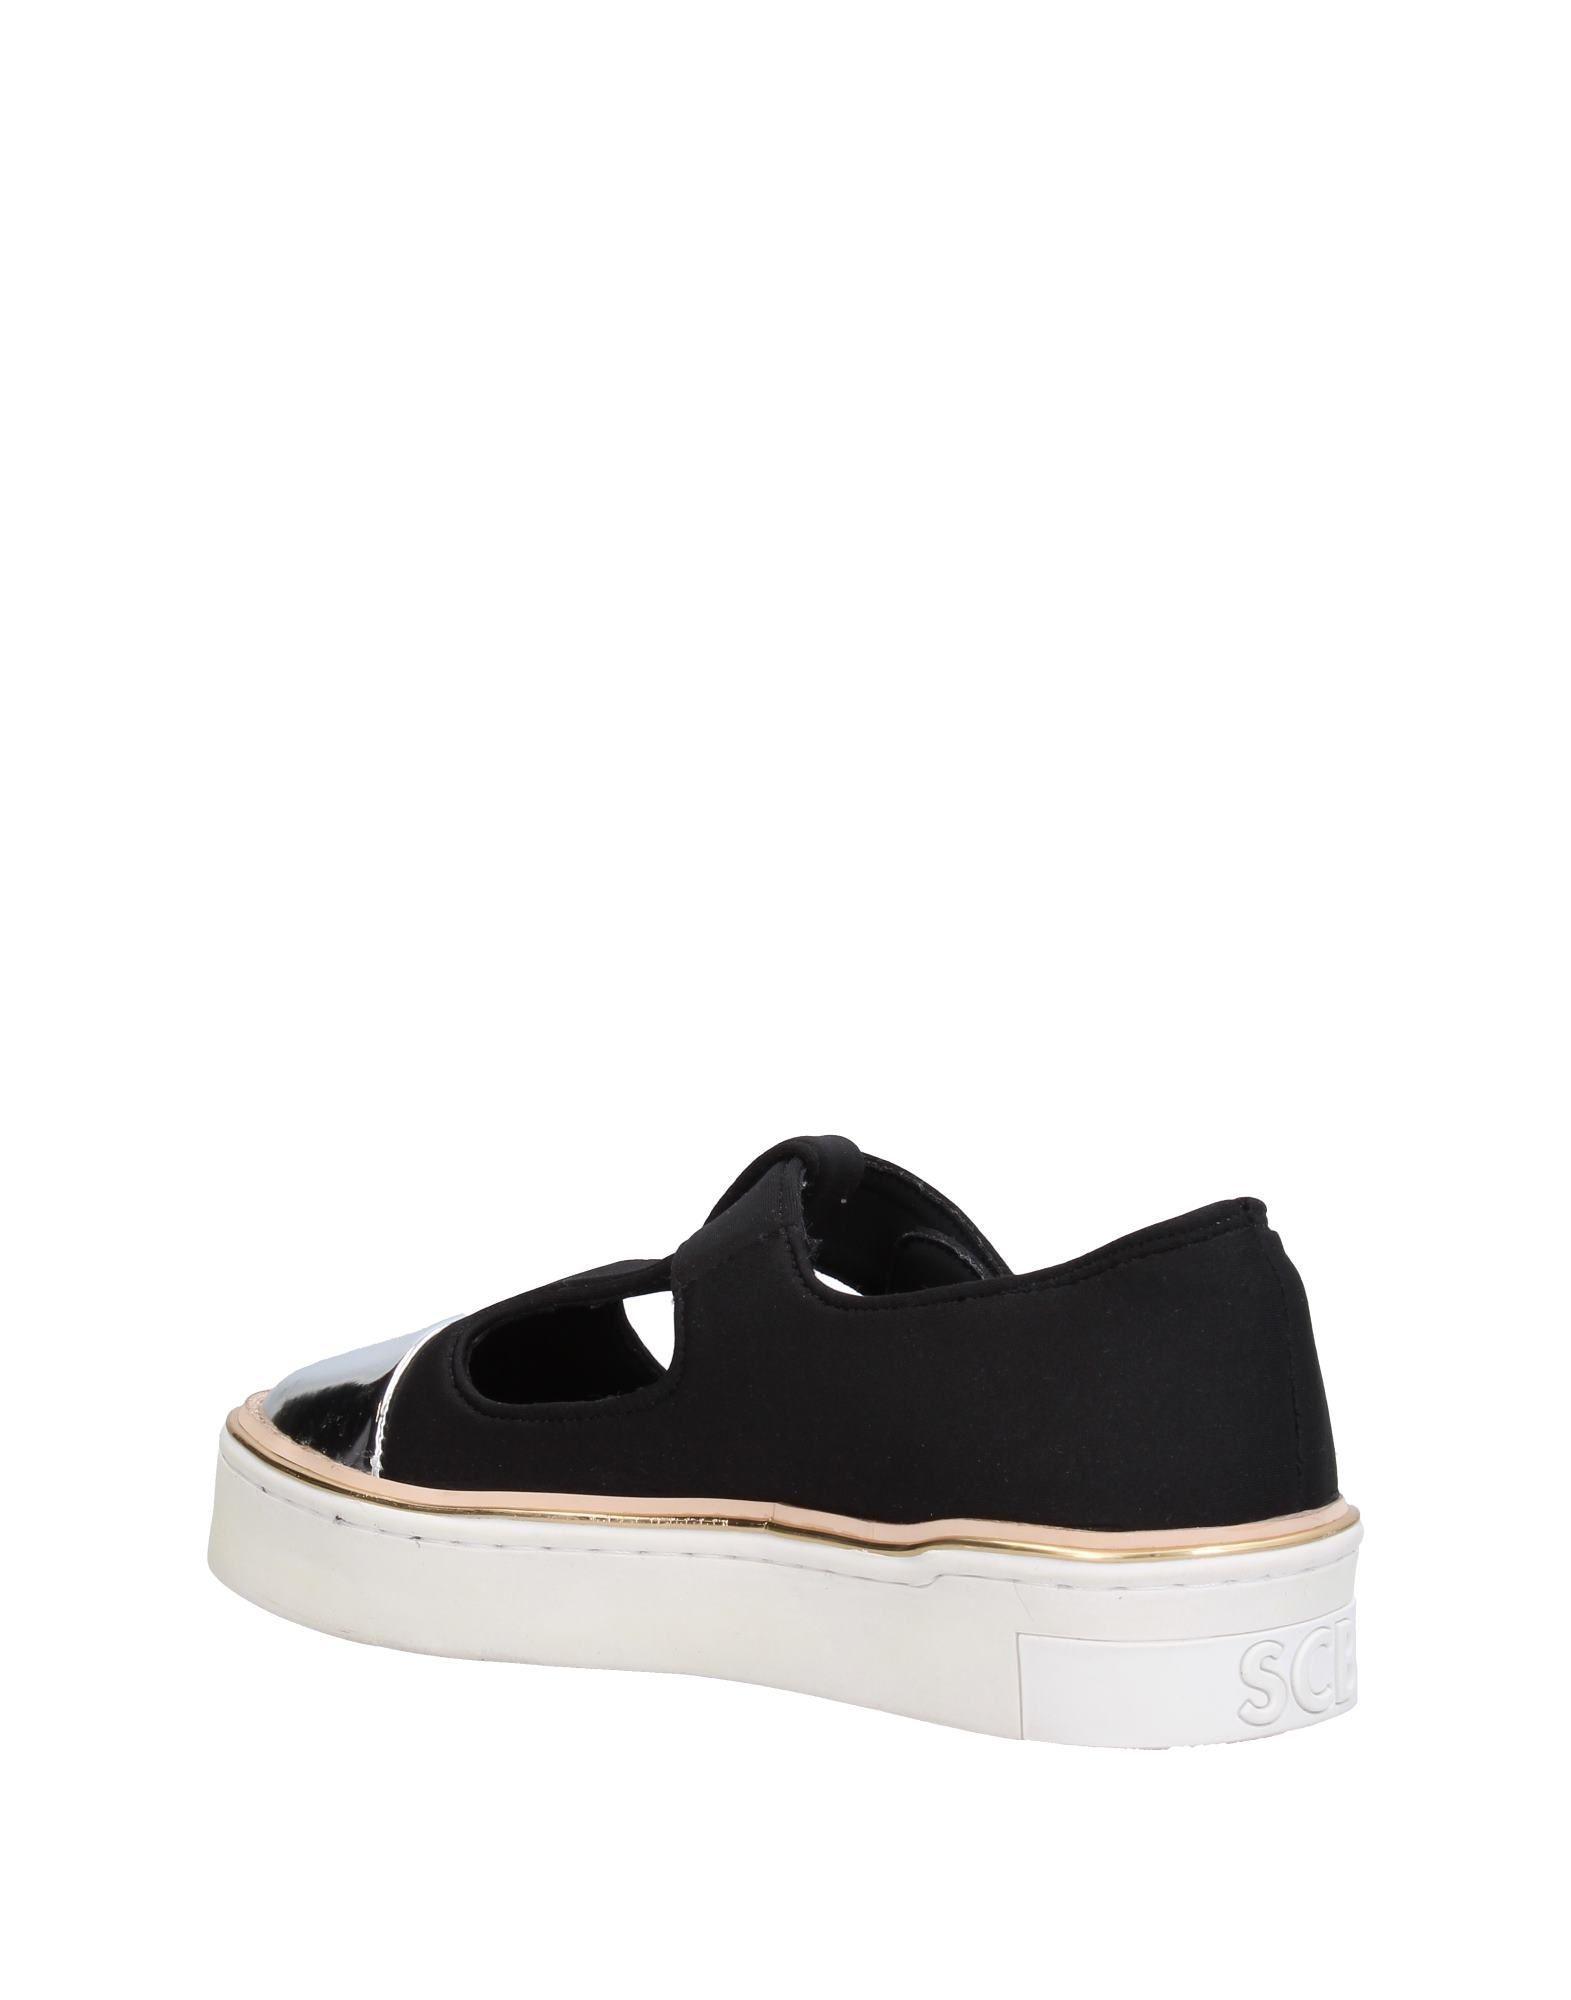 Suecomma Bonnie Low-tops & Sneakers in Black